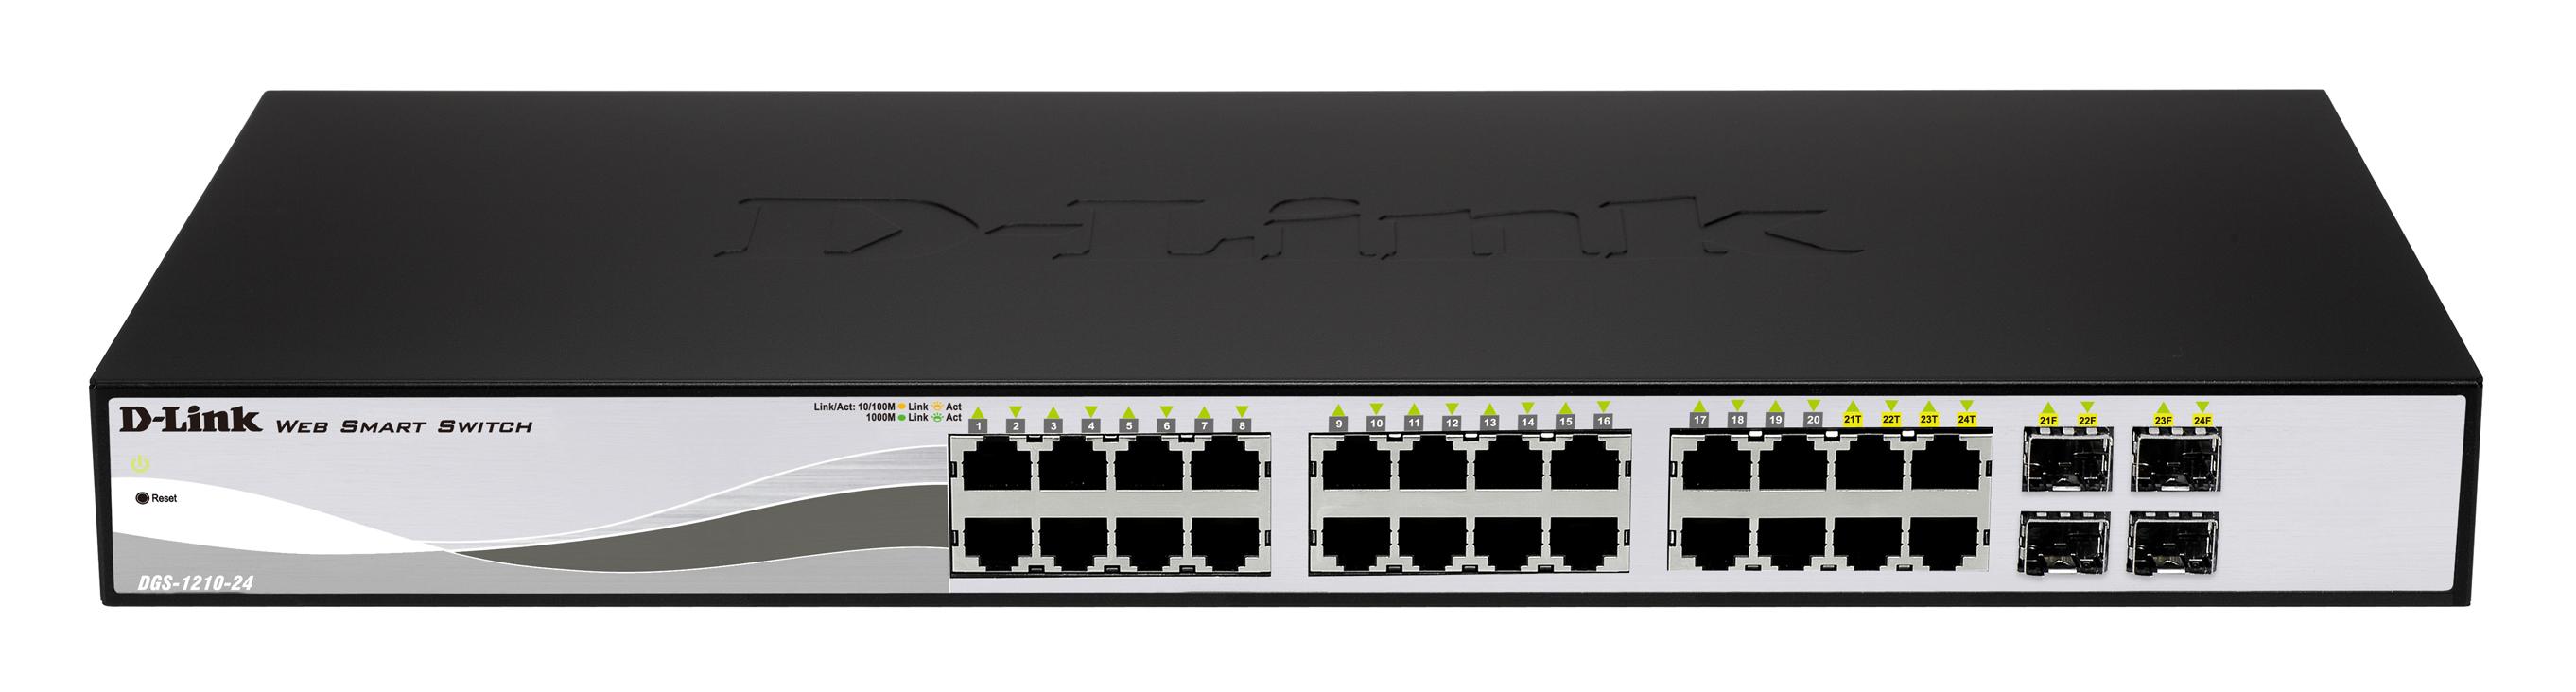 D-Link DGS-1210-24P network switch